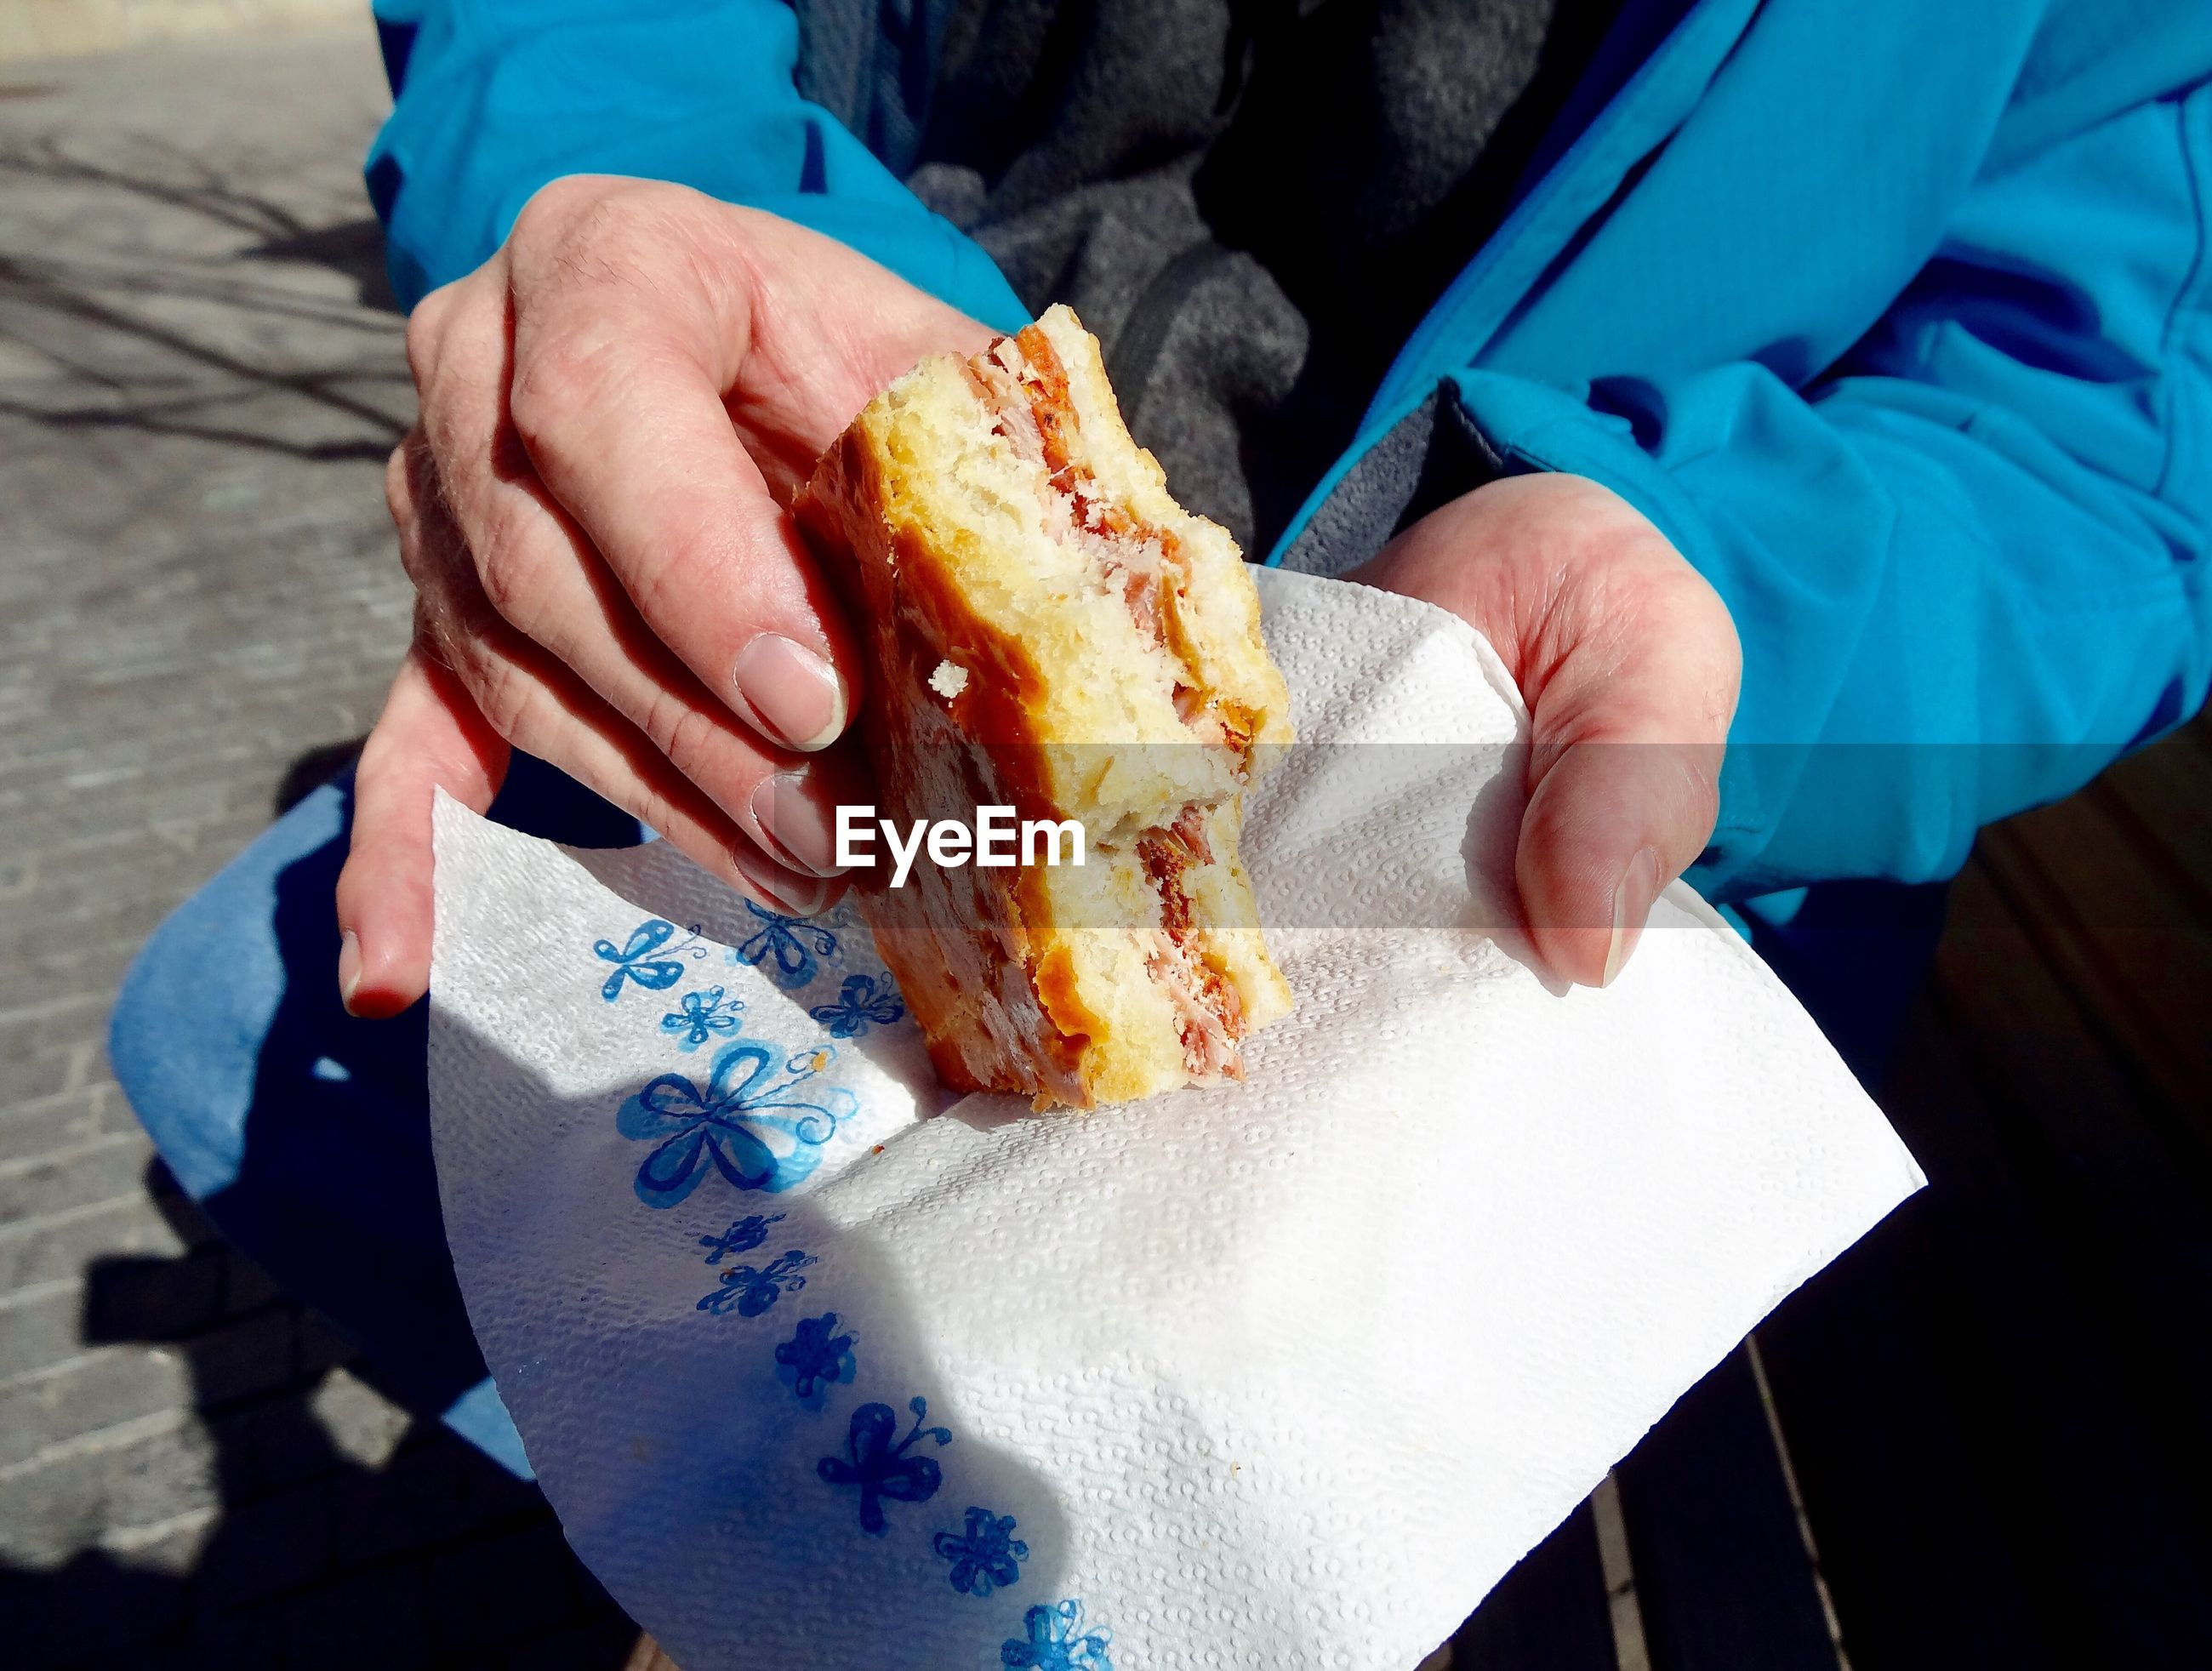 Hands holding street food